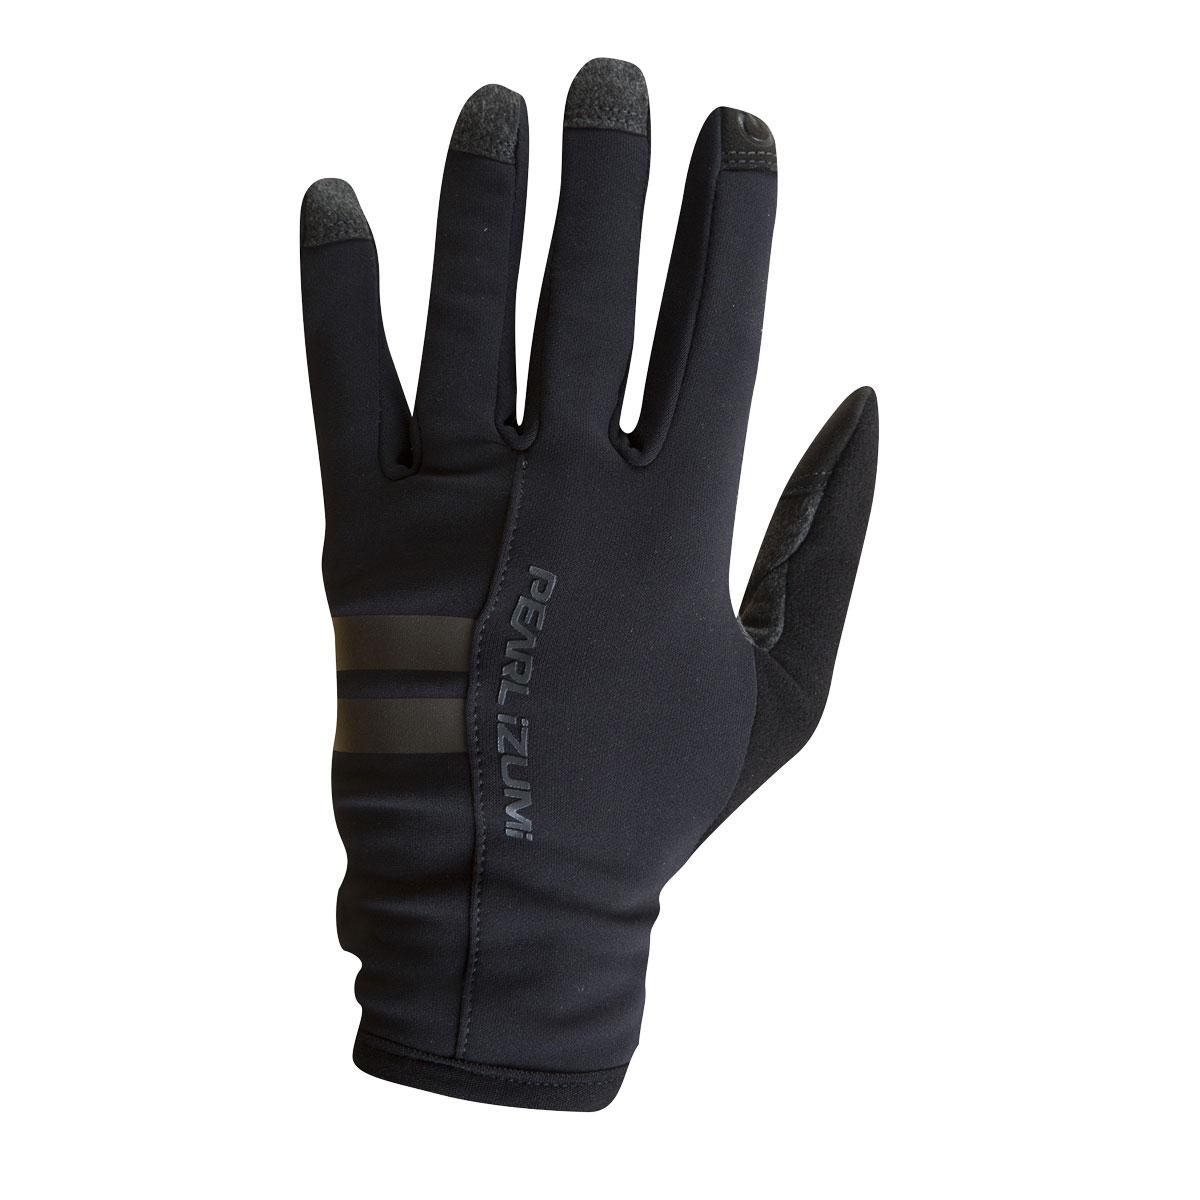 PEARL iZUMi ESCAPE THERMAL rukavice, černá, L